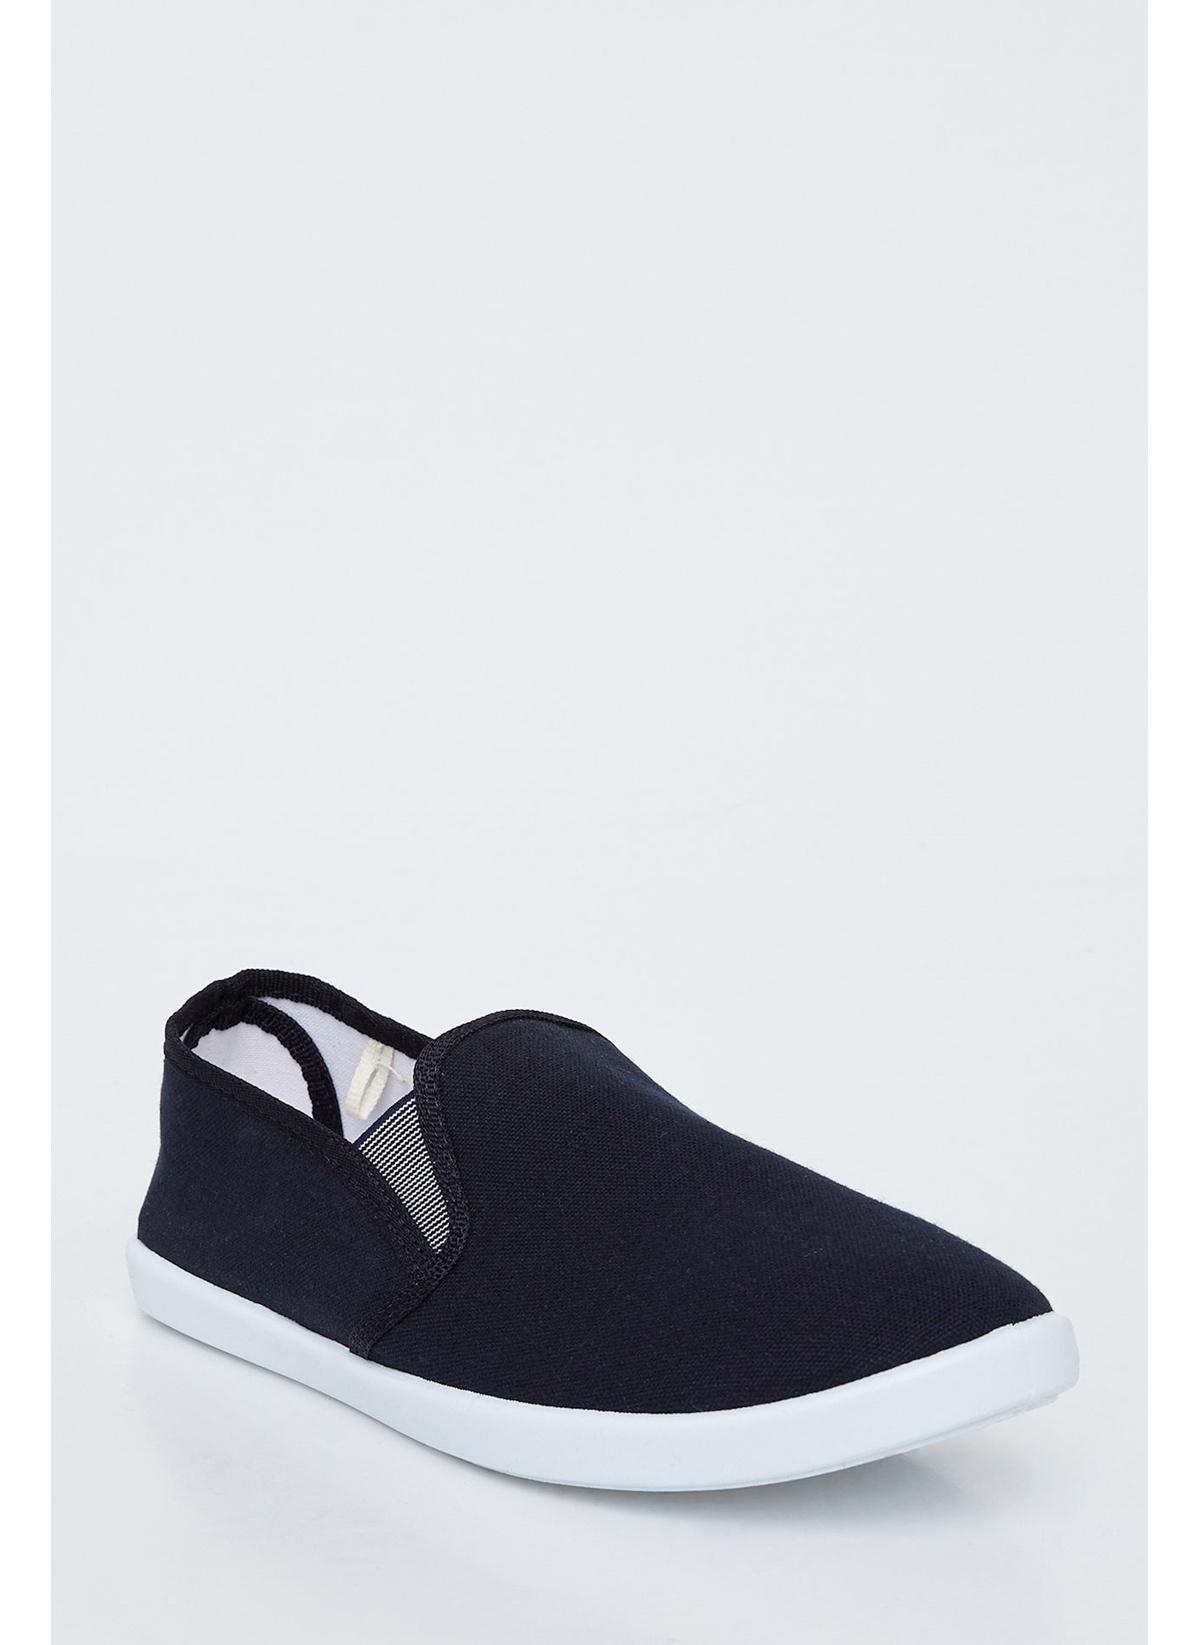 Defacto Basic Ayakkabı K4639az19spbk23lifestyle Ayakkabı – 29.99 TL